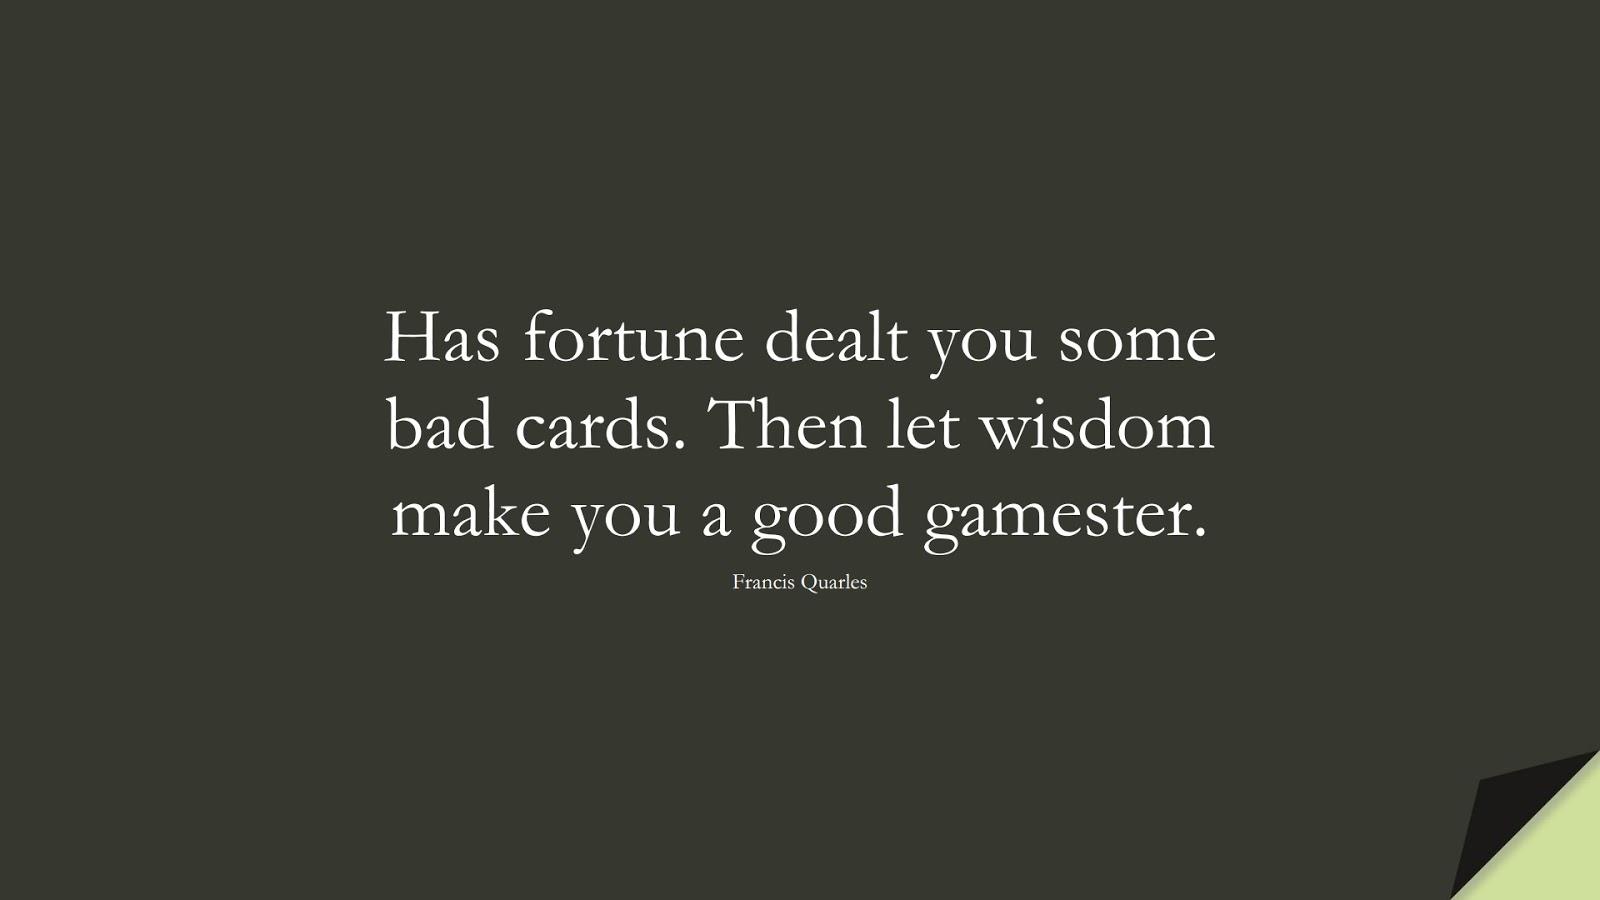 Has fortune dealt you some bad cards. Then let wisdom make you a good gamester. (Francis Quarles);  #WordsofWisdom